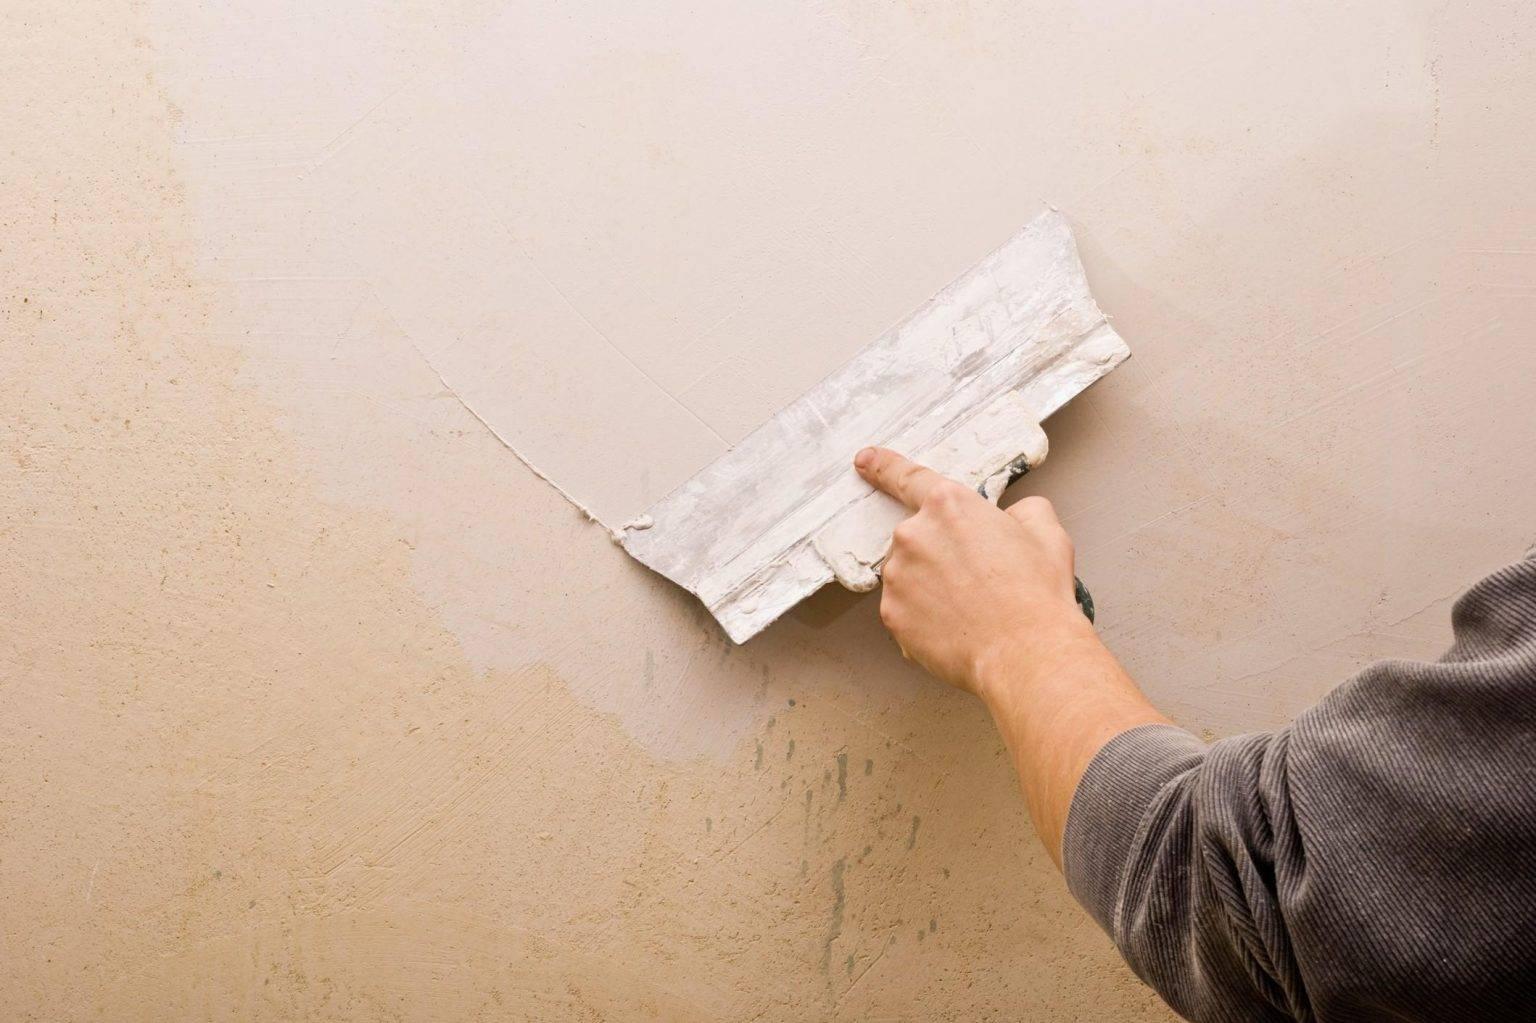 Шпаклевка стен под покраску своими руками пошагово